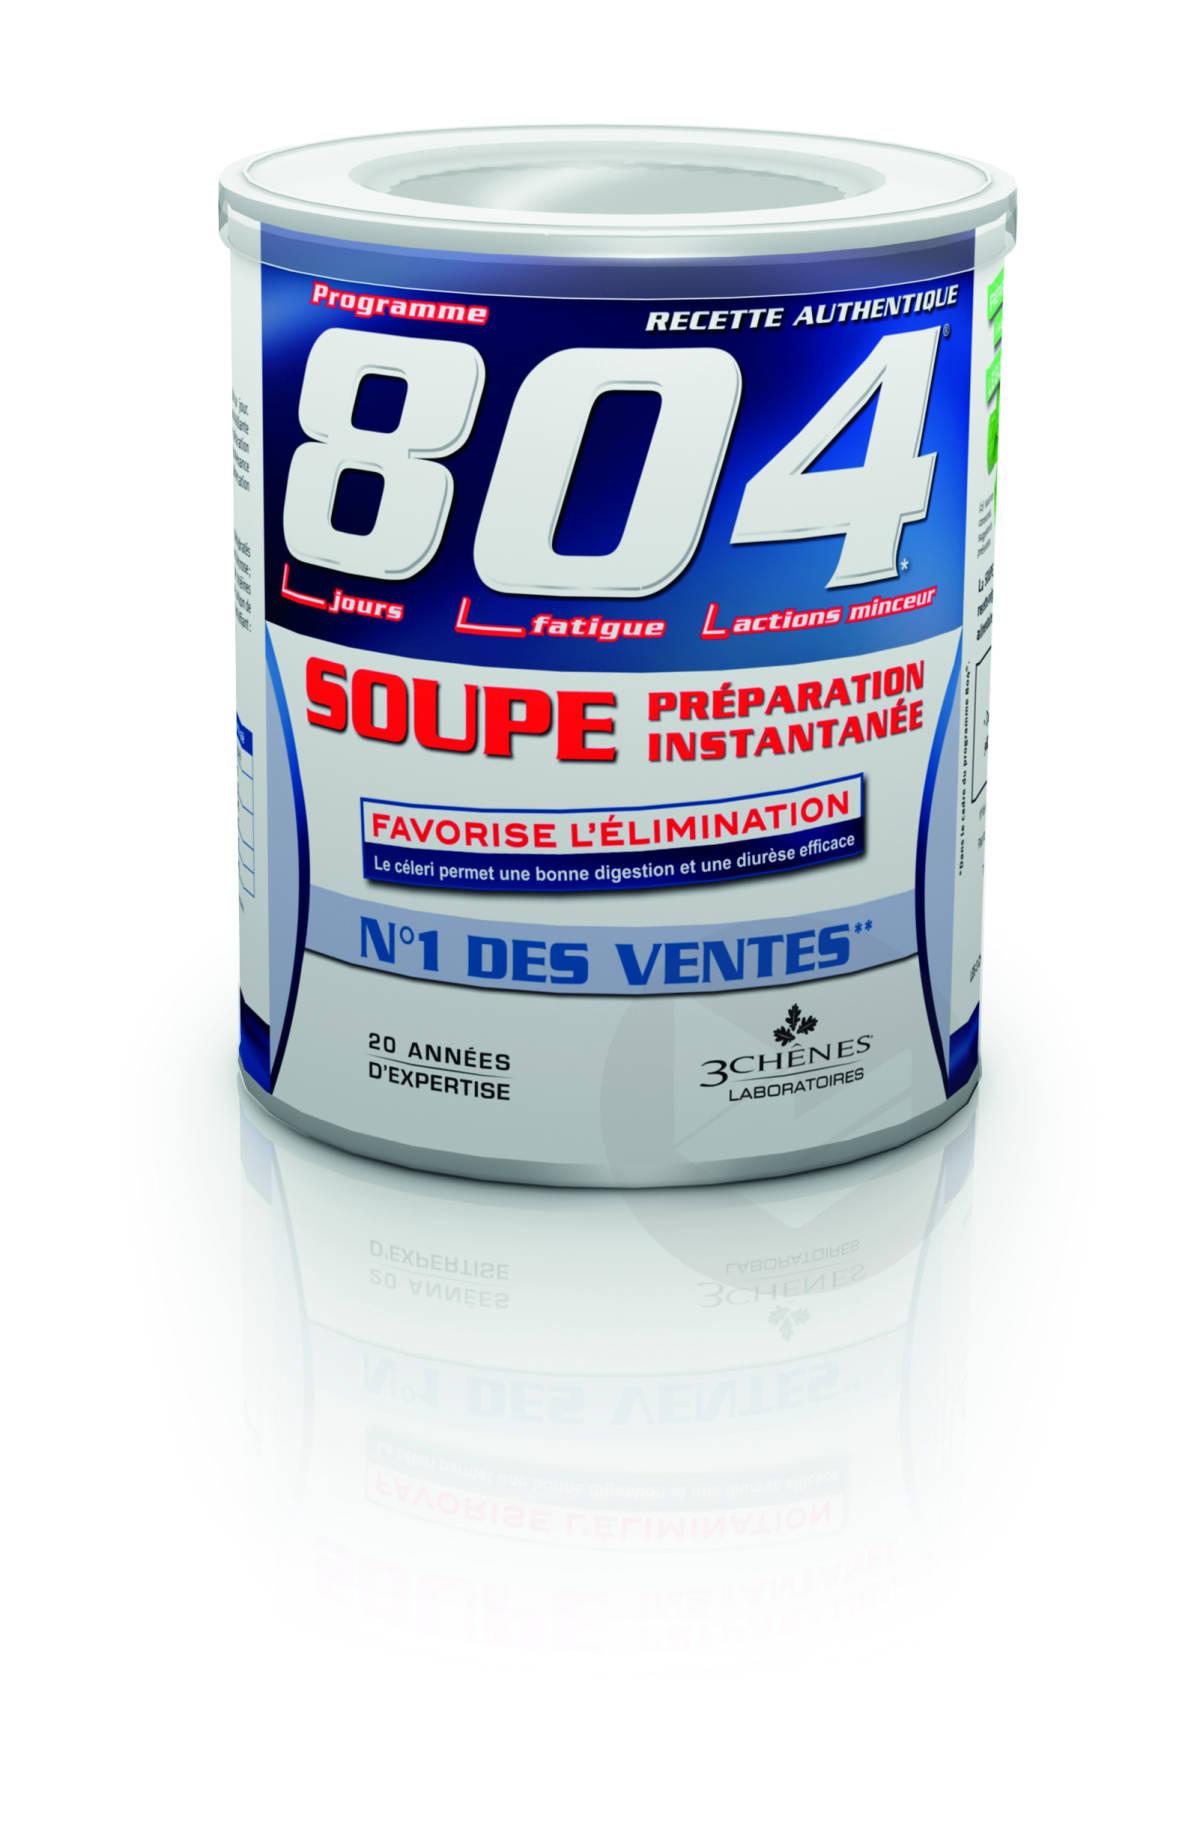 804 Diet Soup 300g